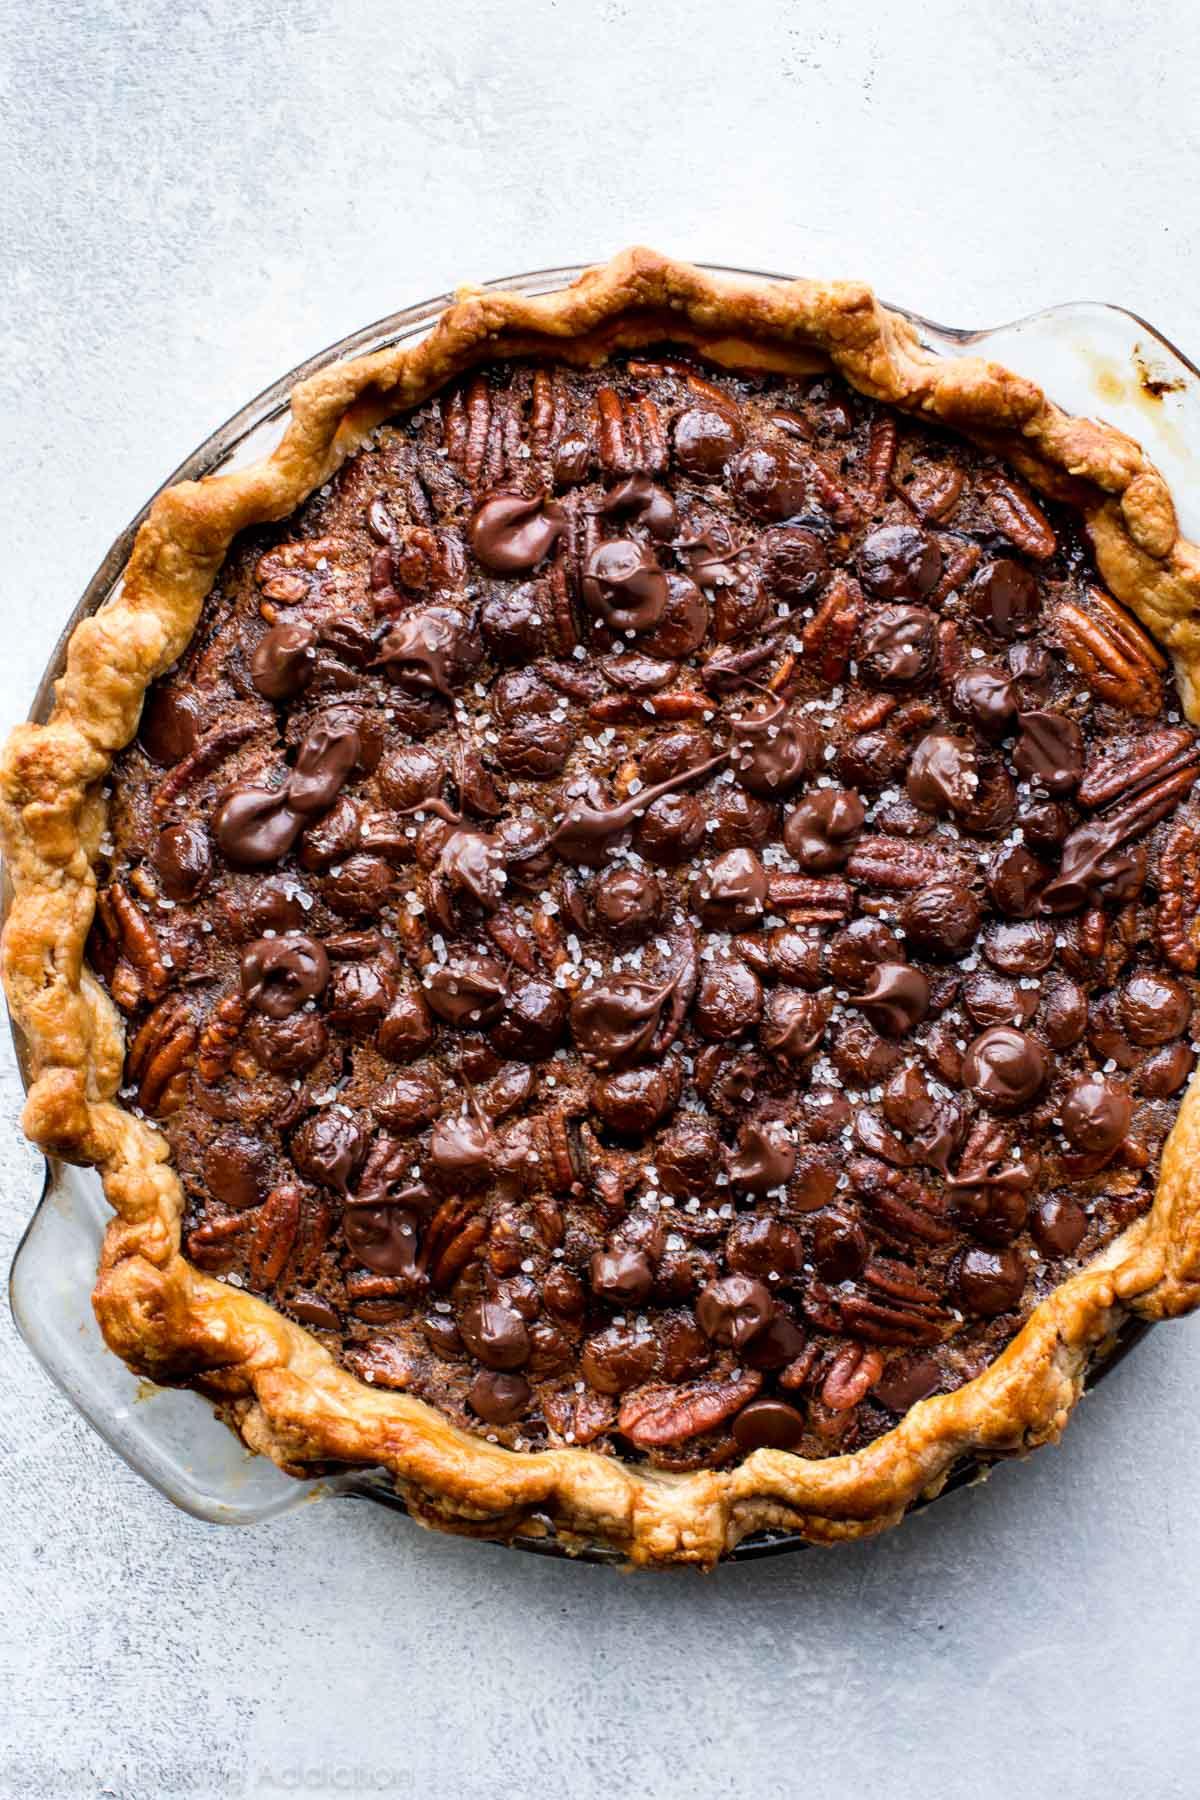 Dark Chocolate Pecan Pie - Sallys Baking Addiction